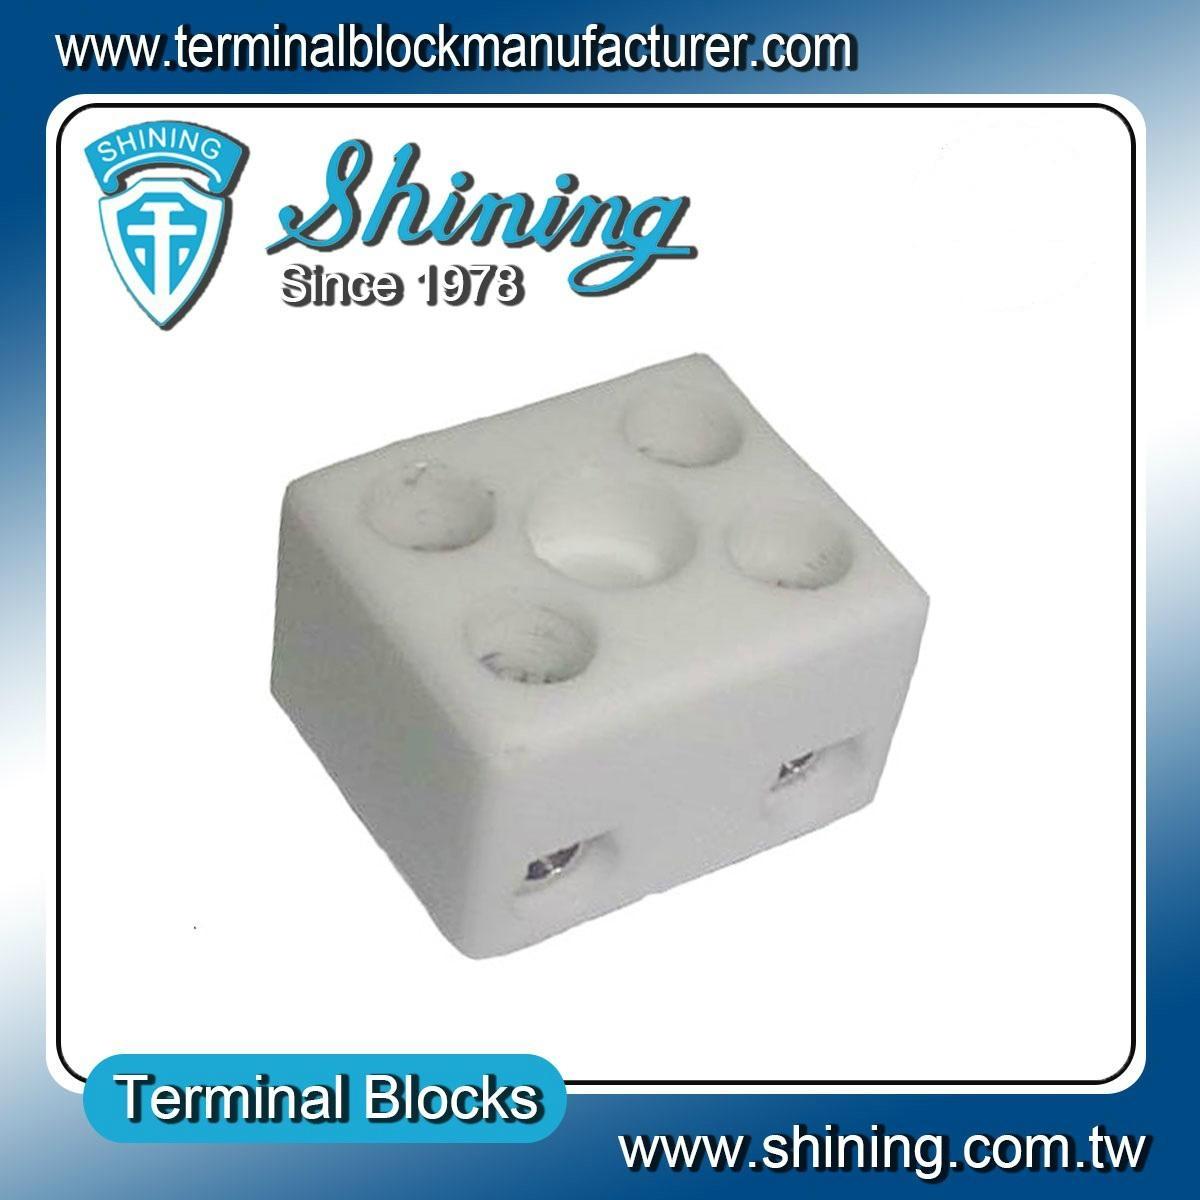 TC-202-A 陶瓷端子台 Ceramic Terminal Block 1